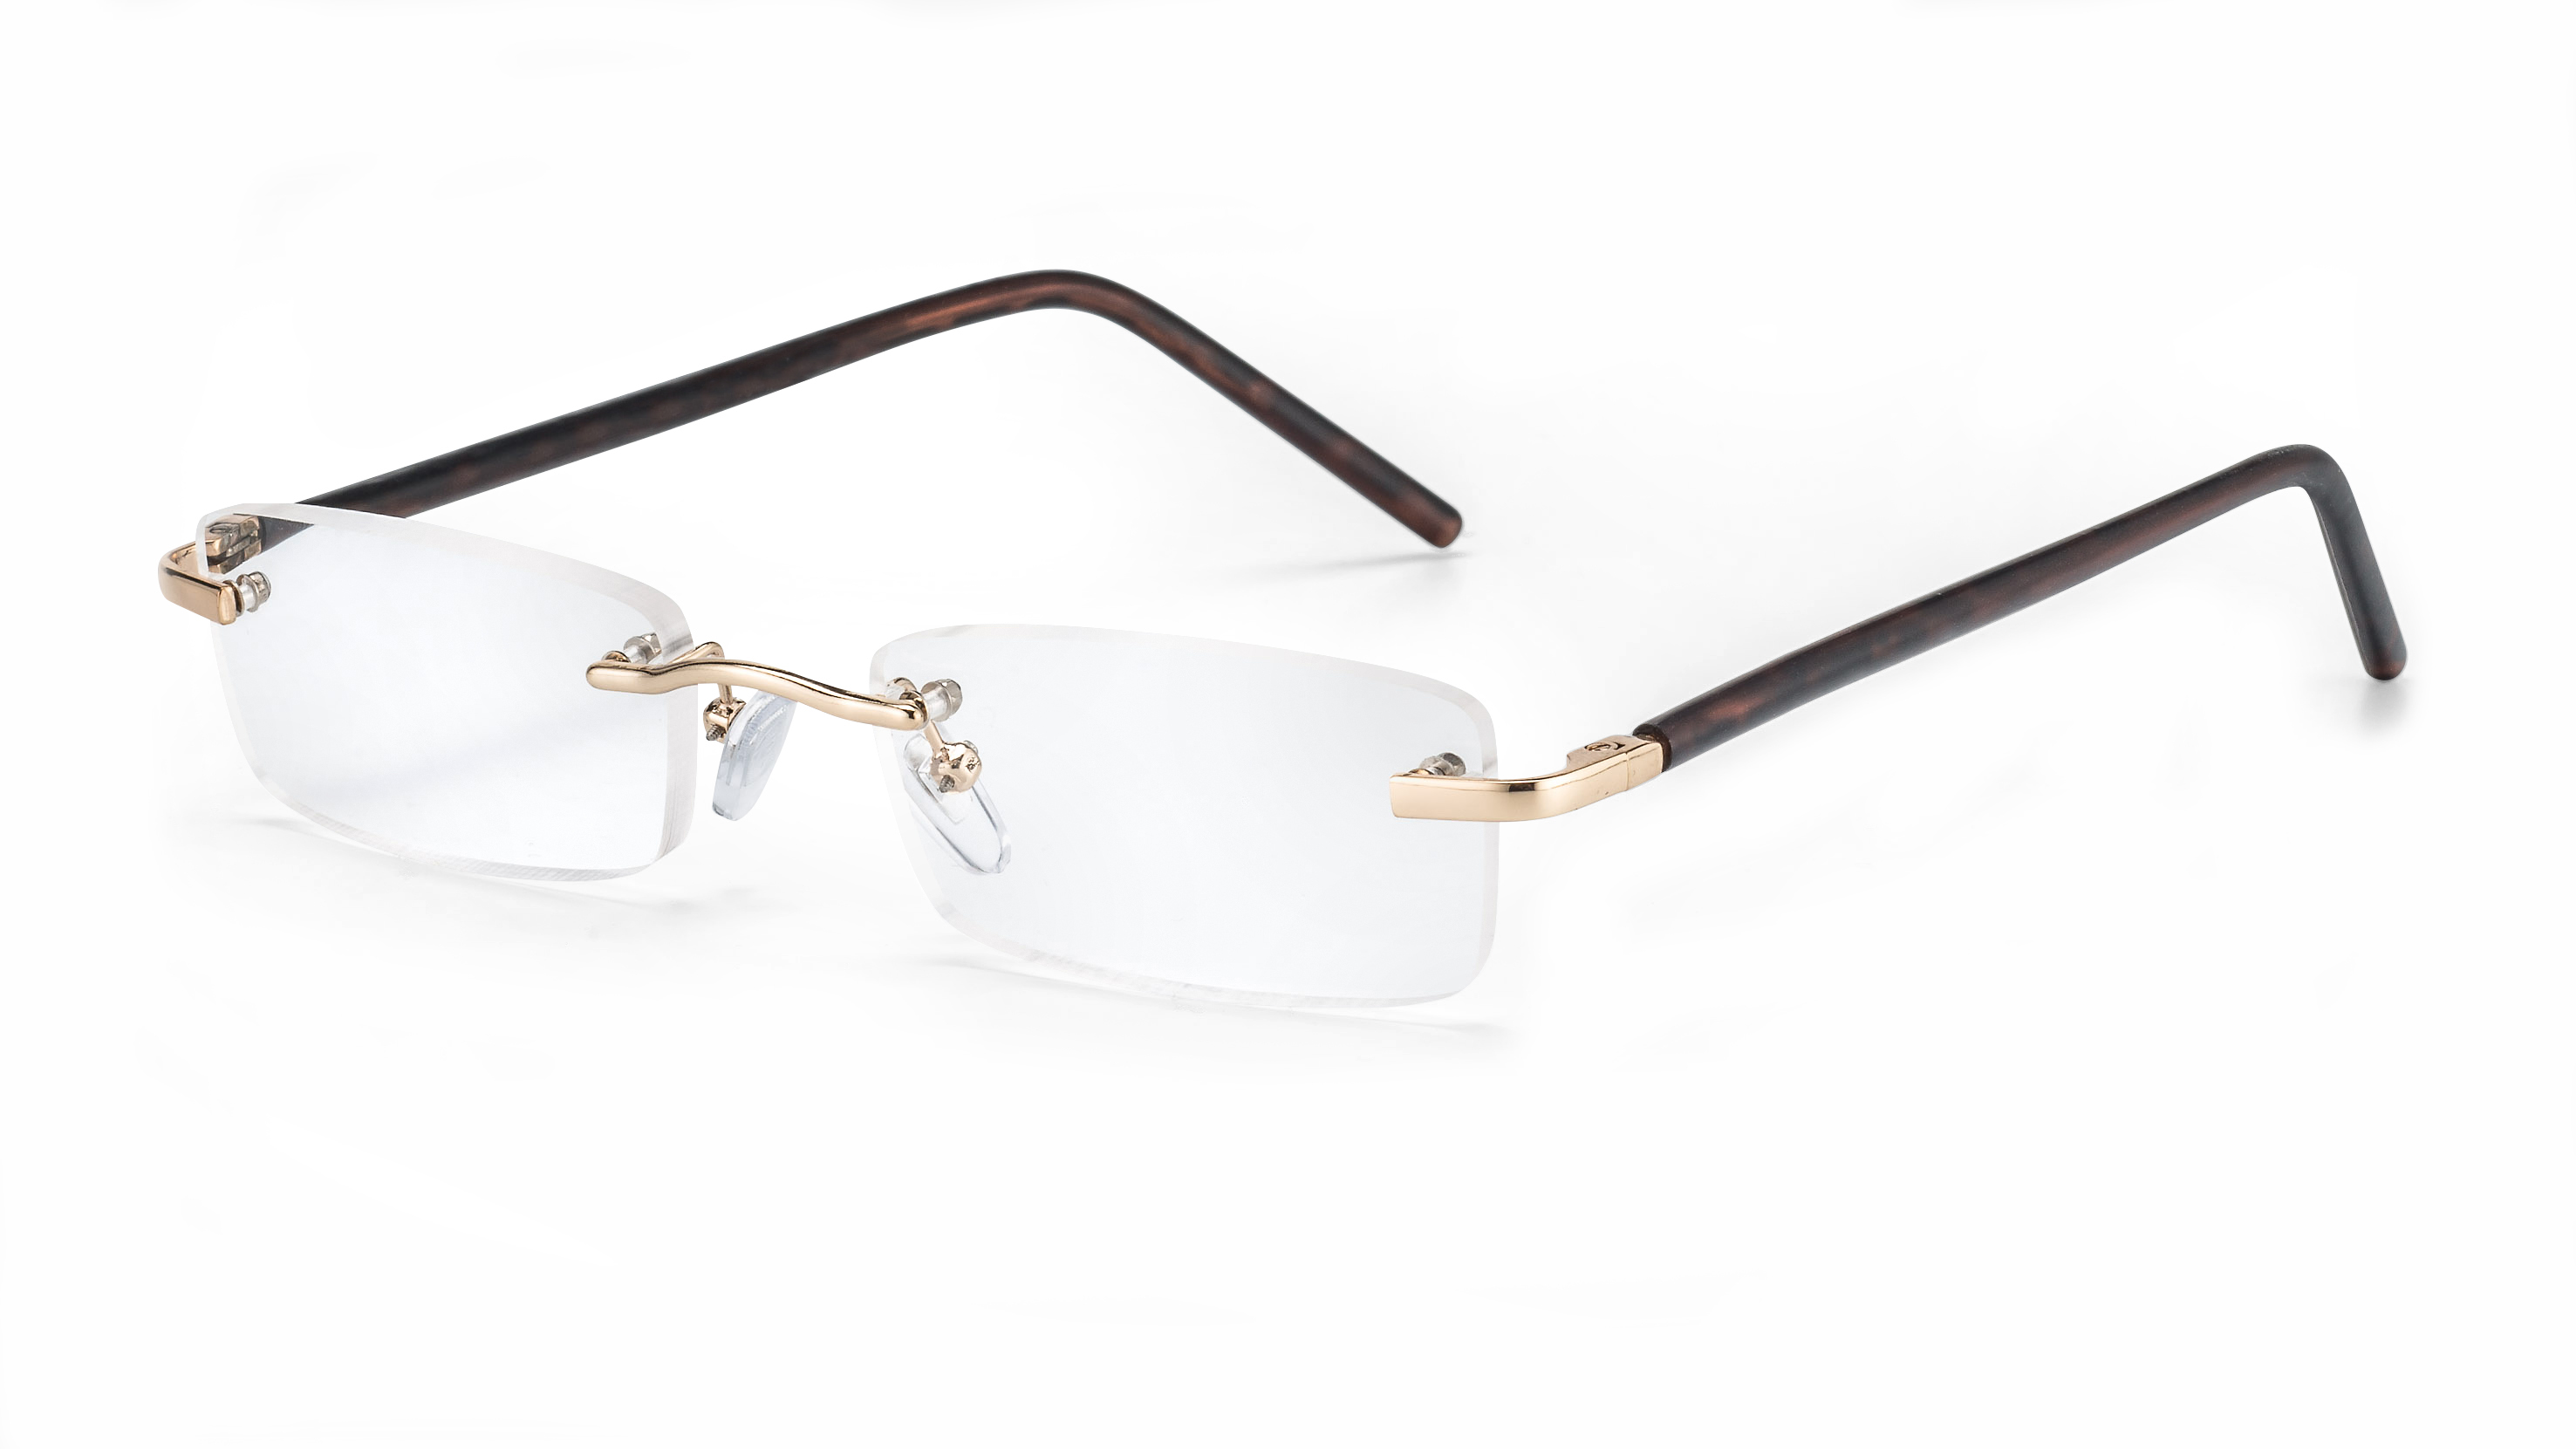 Main view reading glasses Monaco havana brown